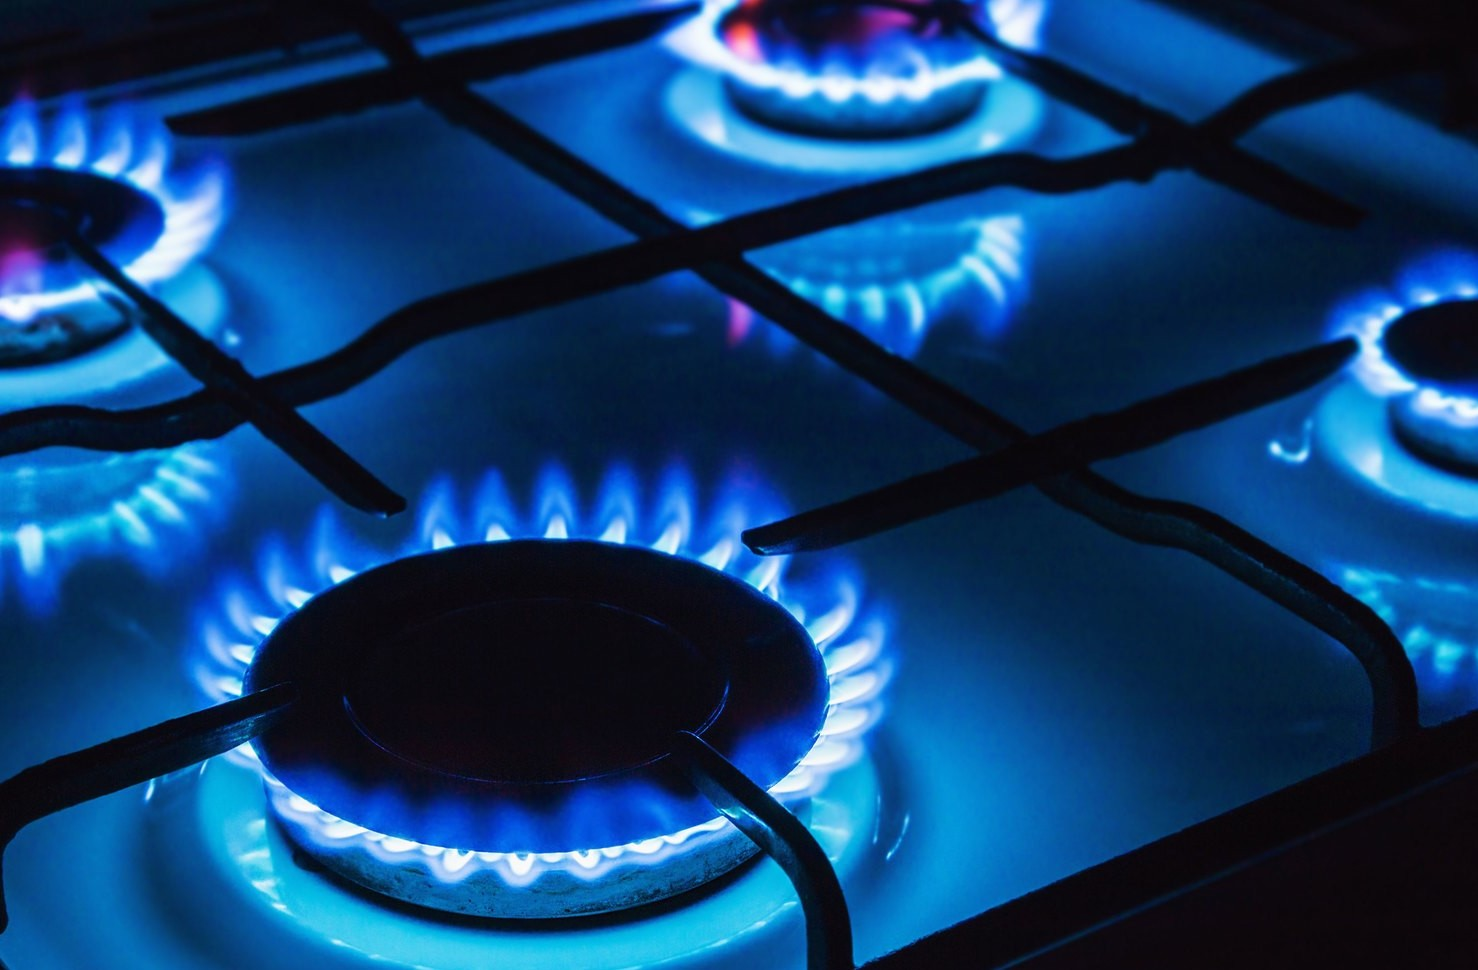 Tariffe gas, offerte a confronto. Le mig